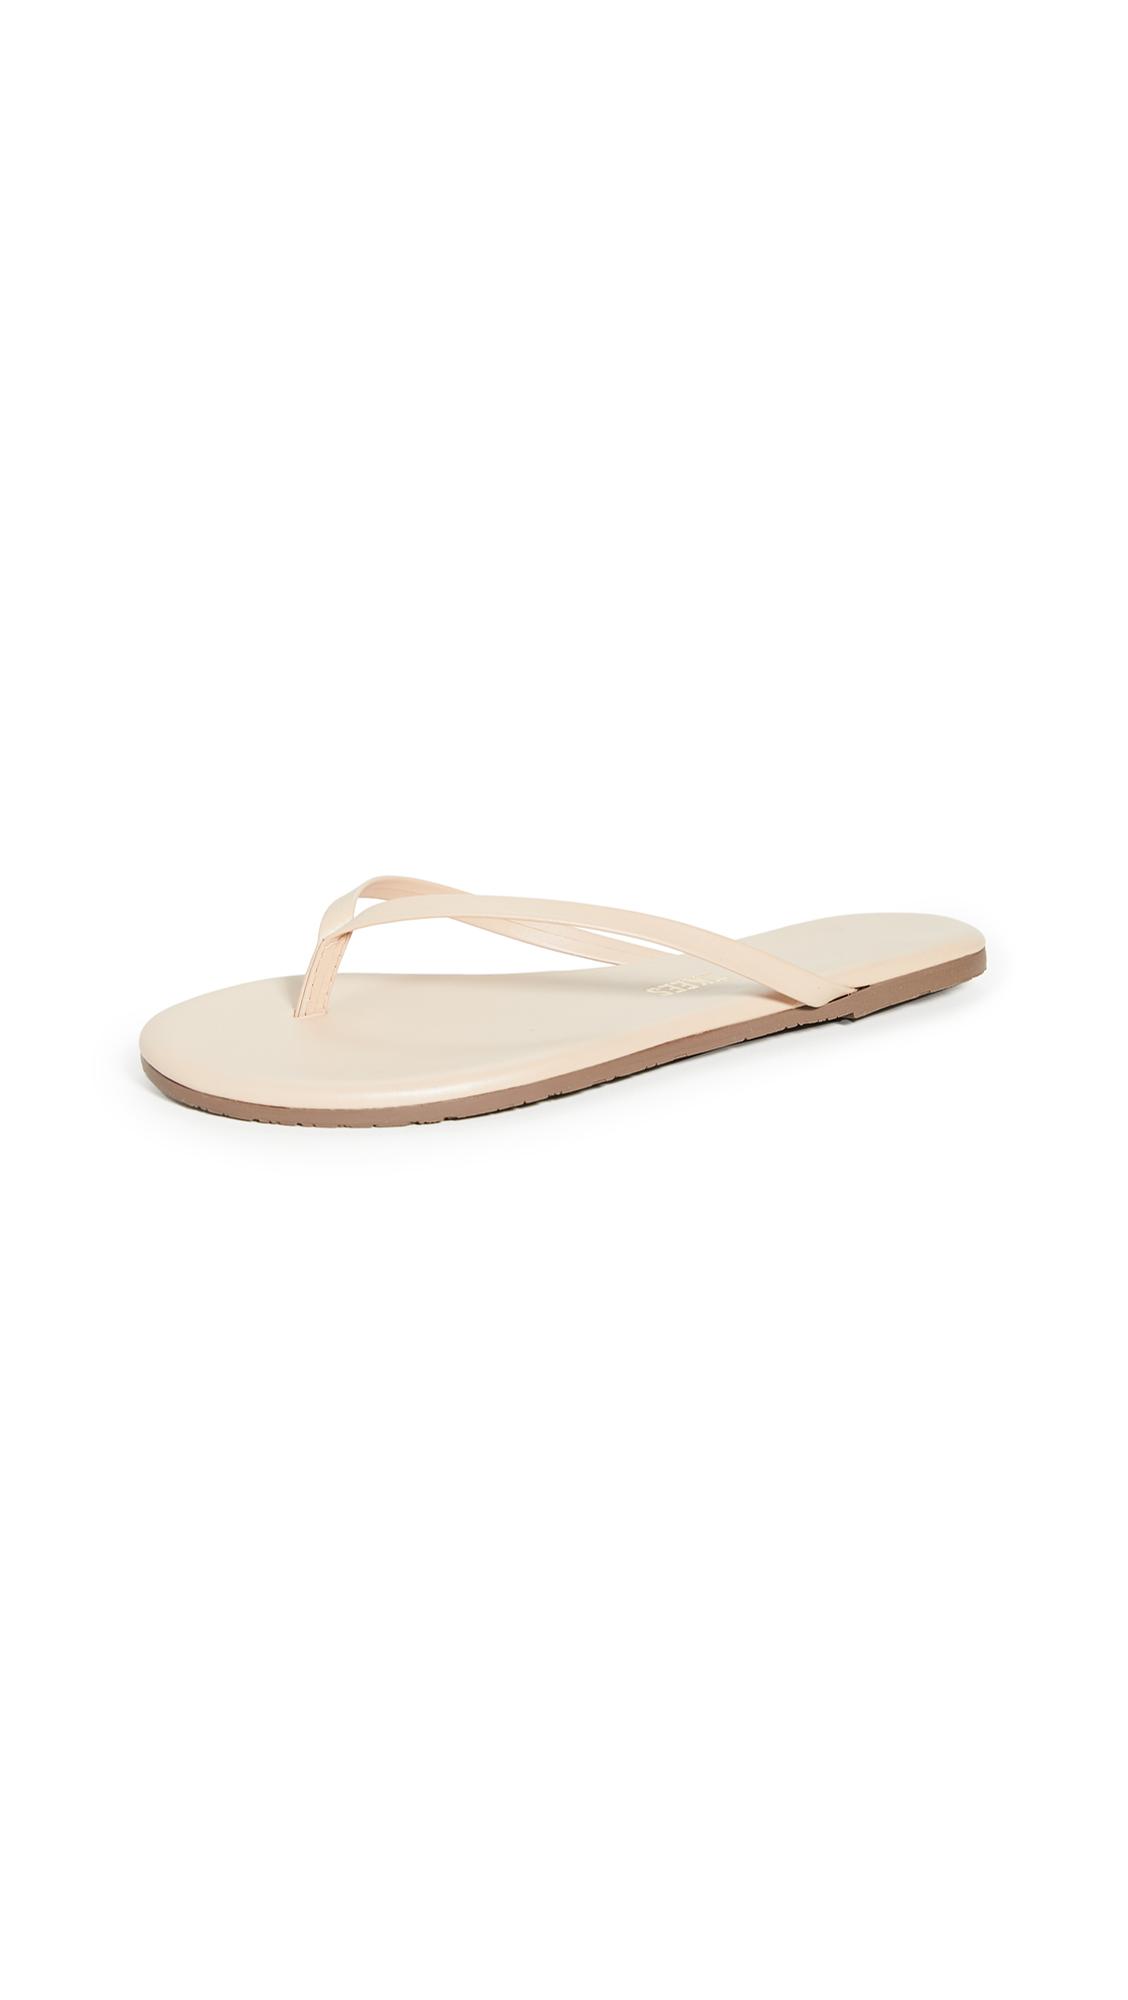 TKEES Foundations Shimmer Flip Flops